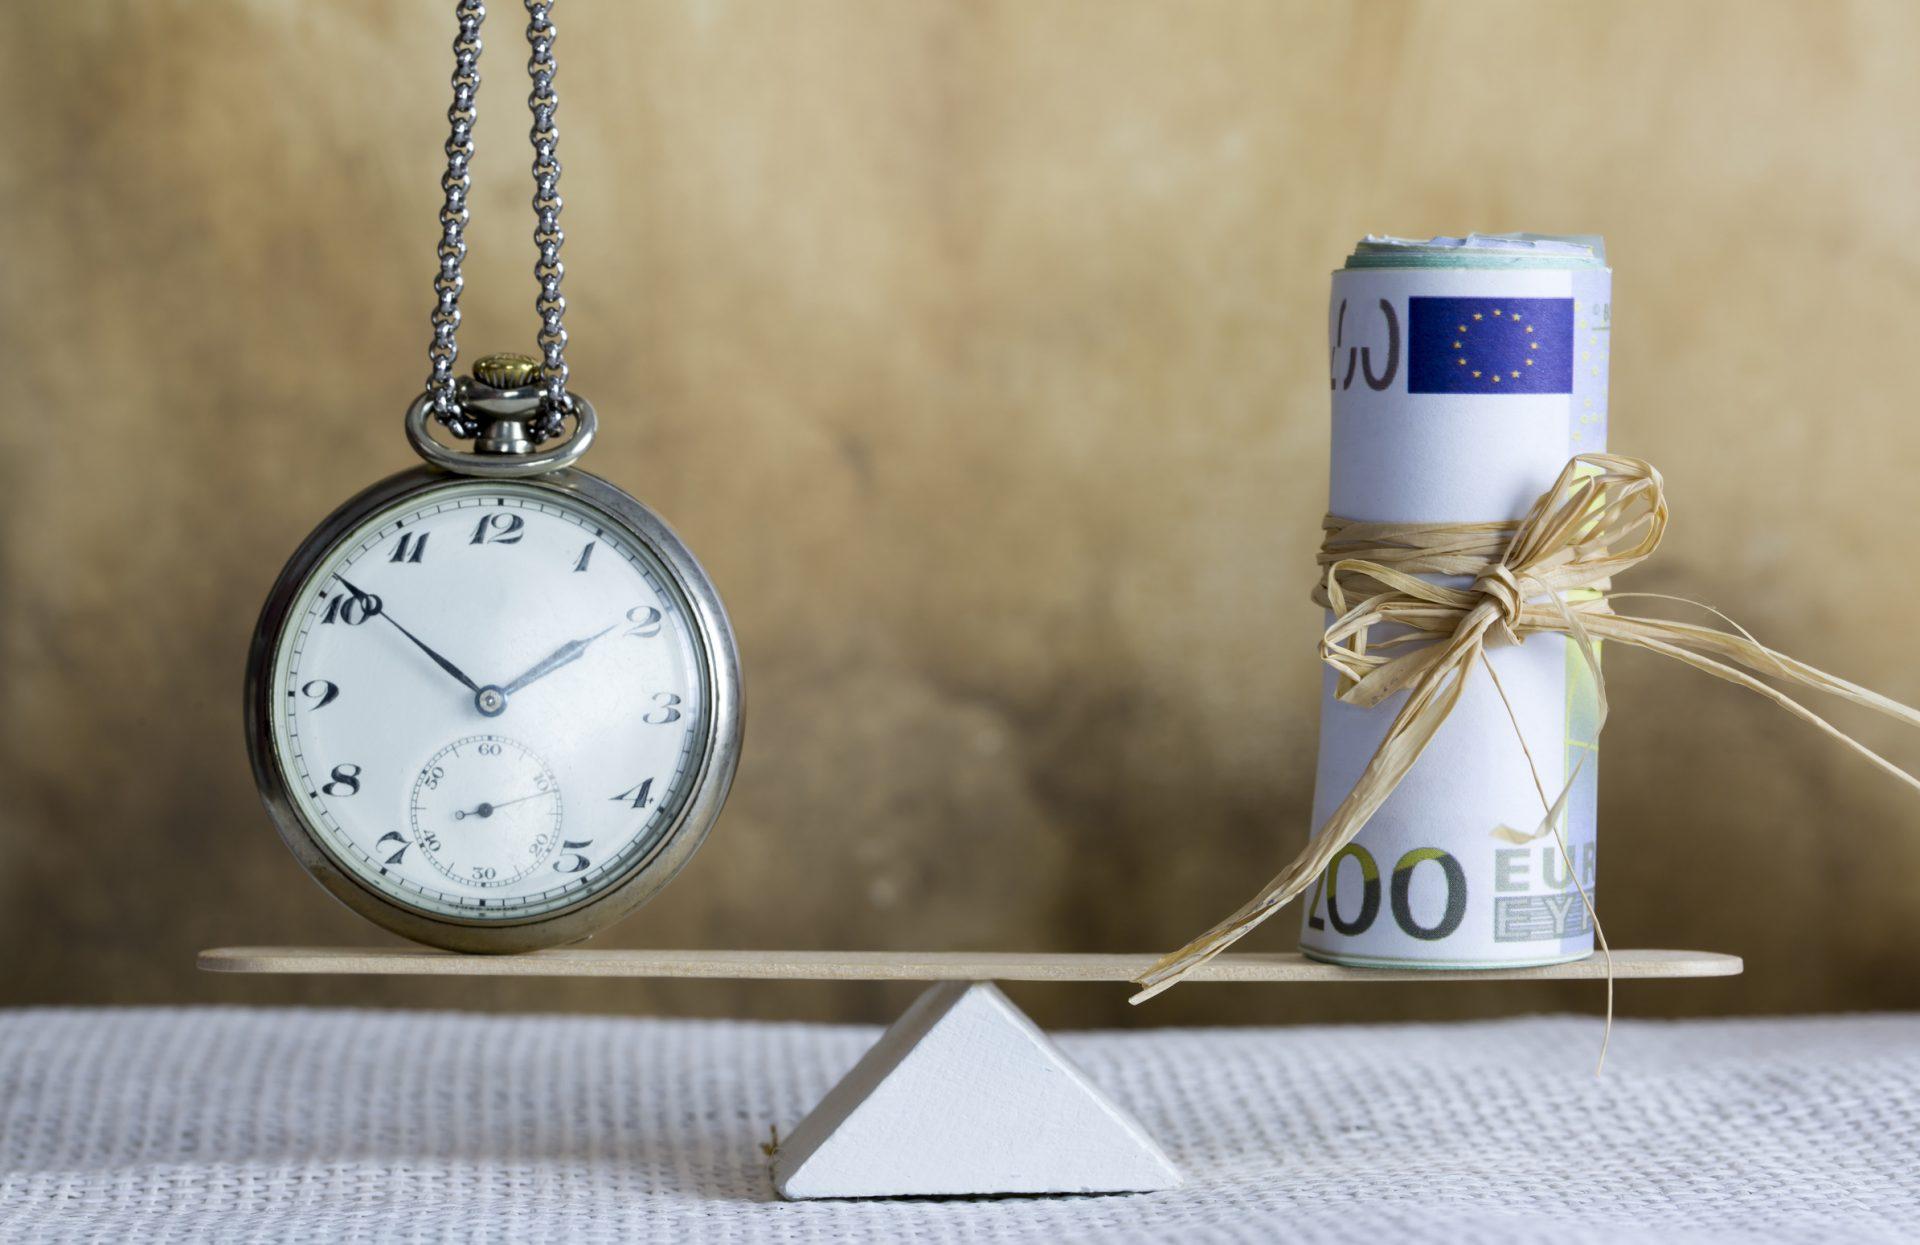 Fotolia 125034302 L 300x195 - Venture debt digitalkaufmann.de